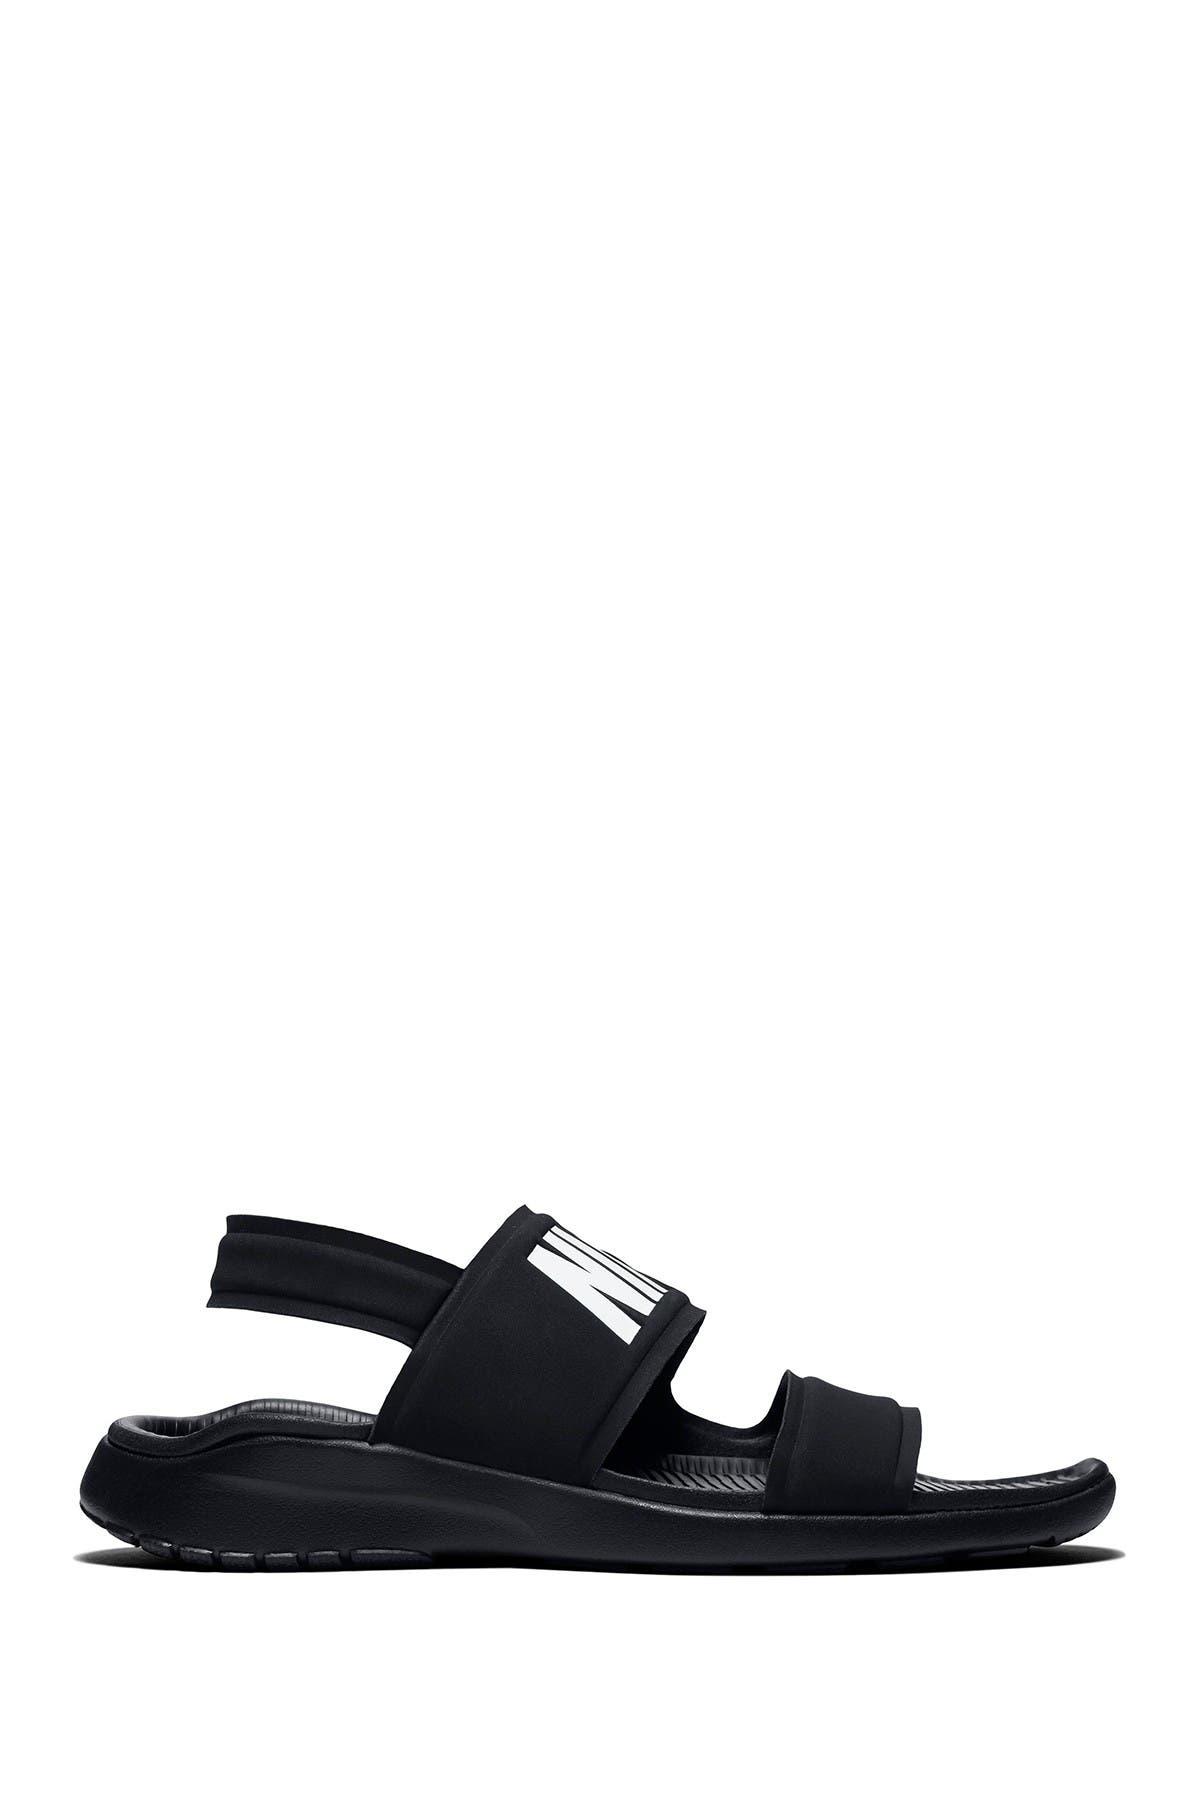 nike tanjun sandals foot locker